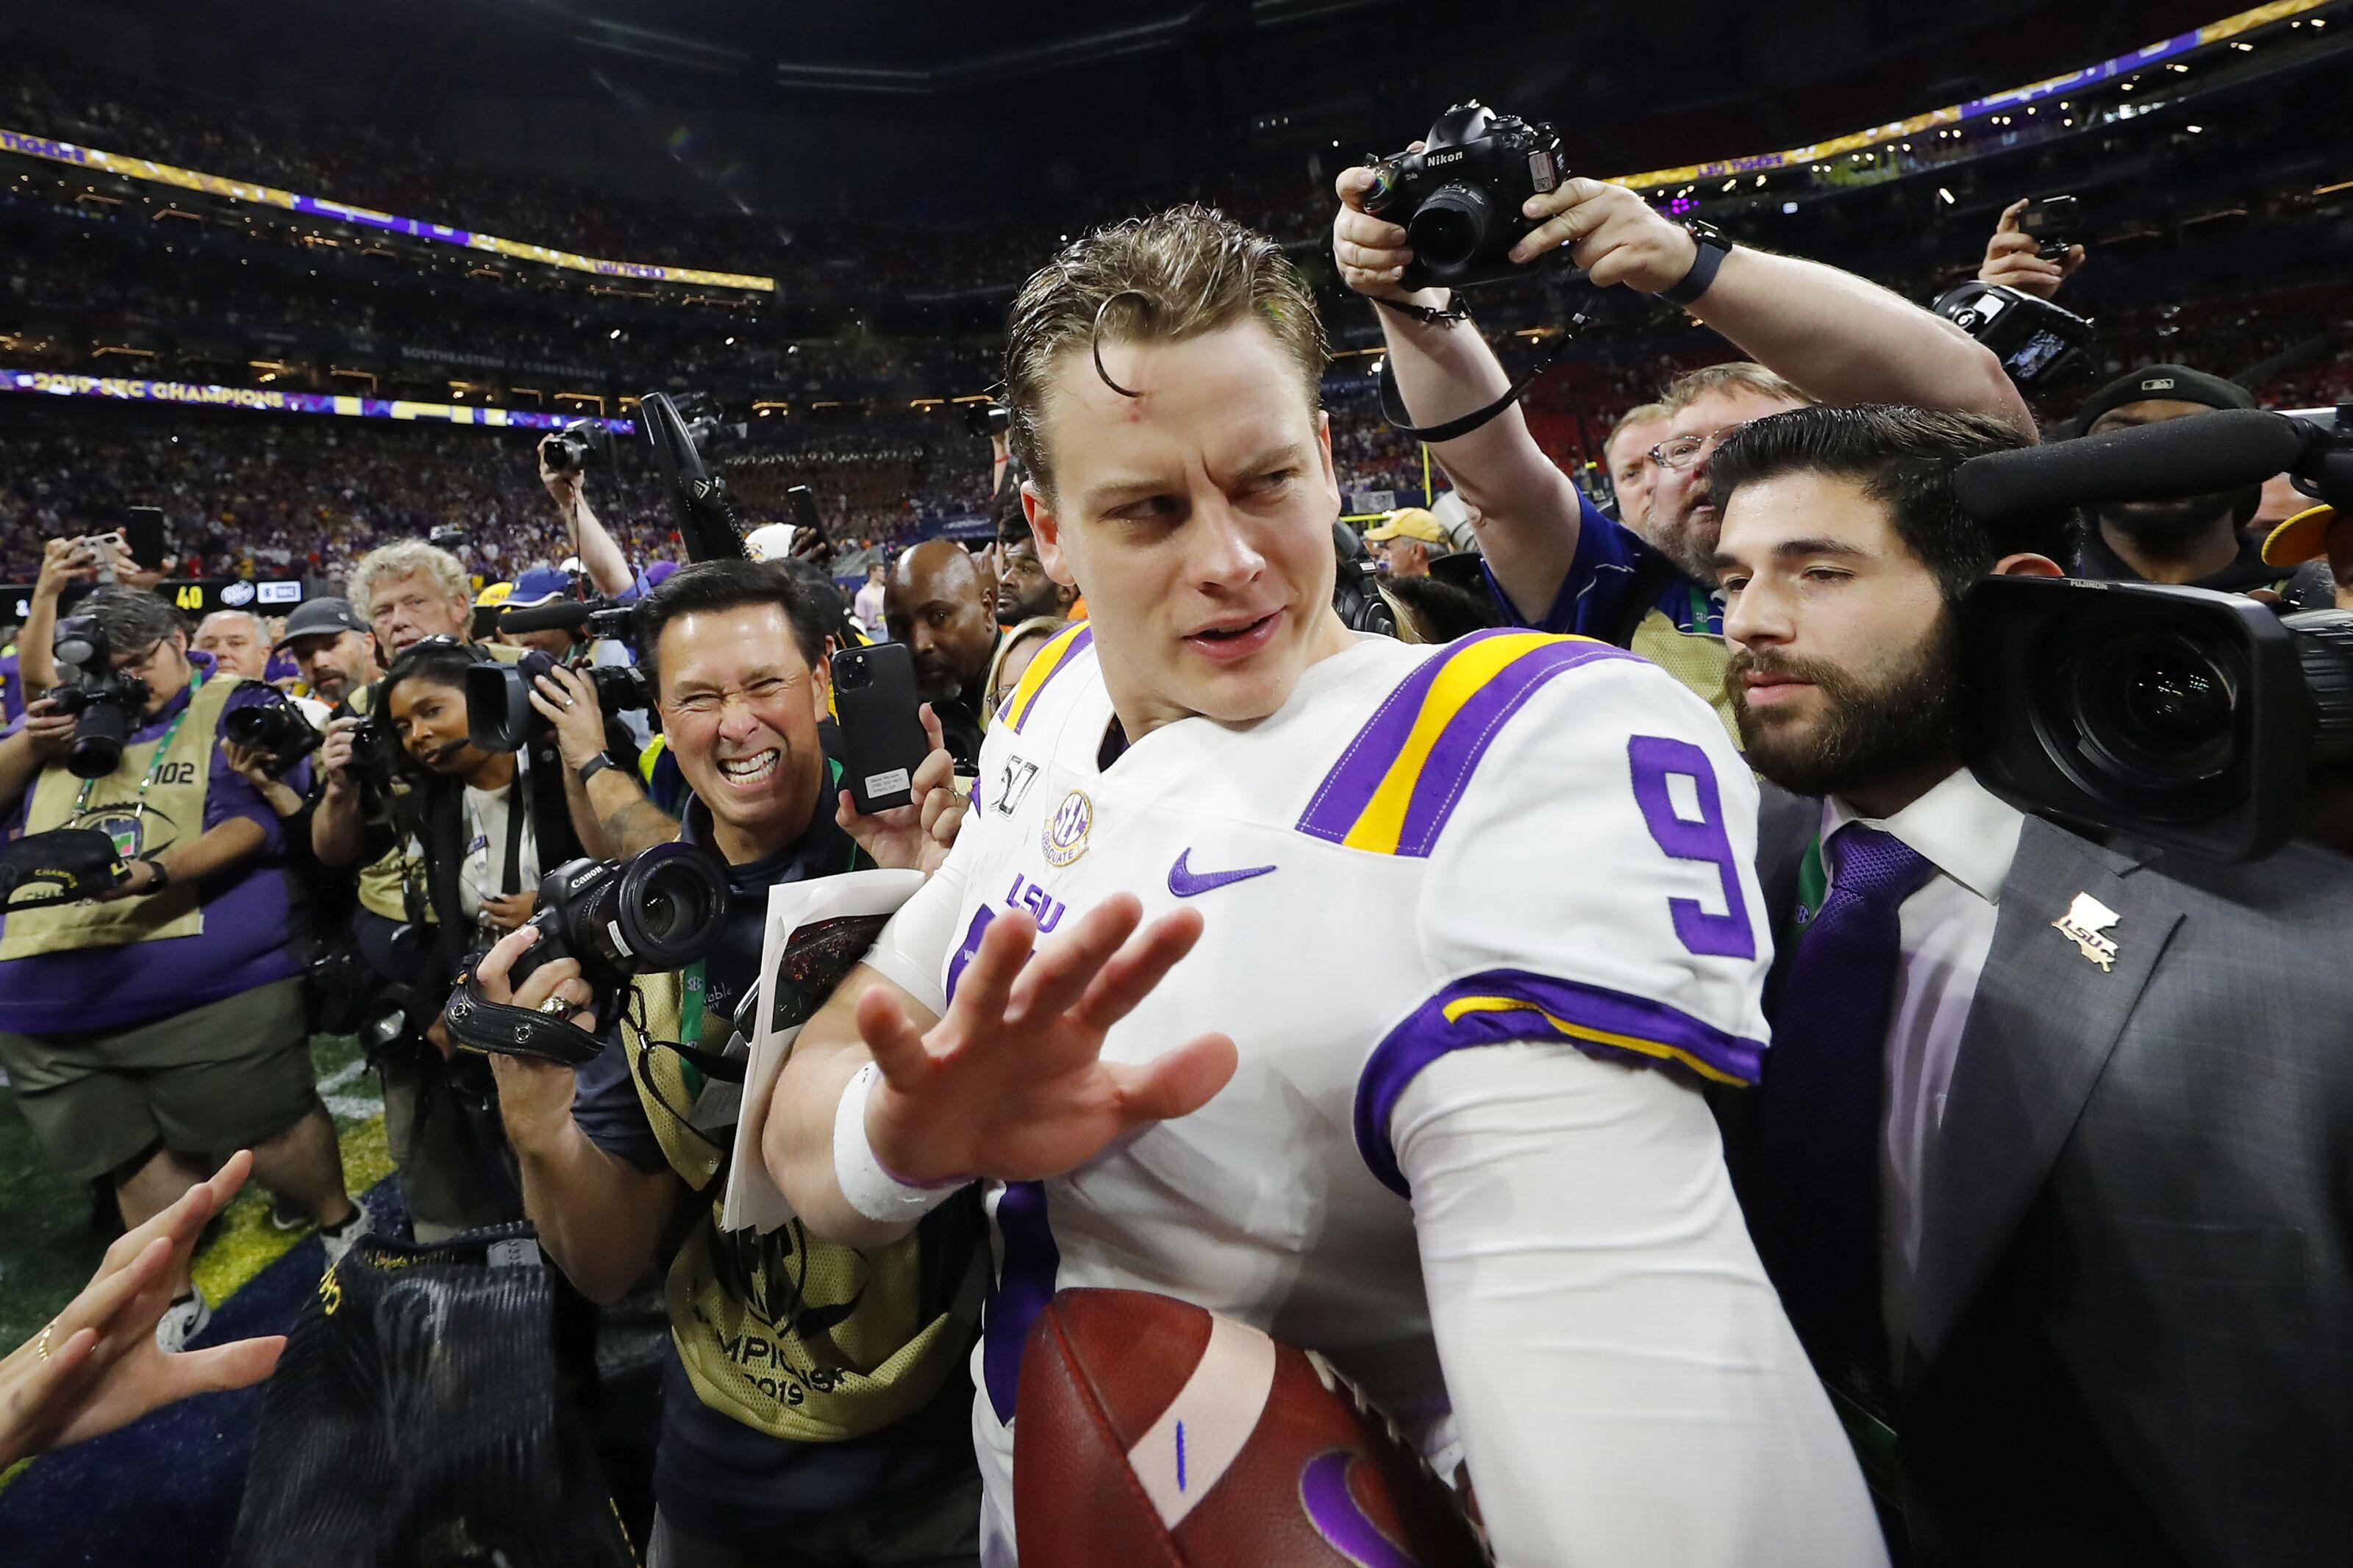 2020 NFL Draft Scenarios: What if Joe Burrow says no to Bengals?